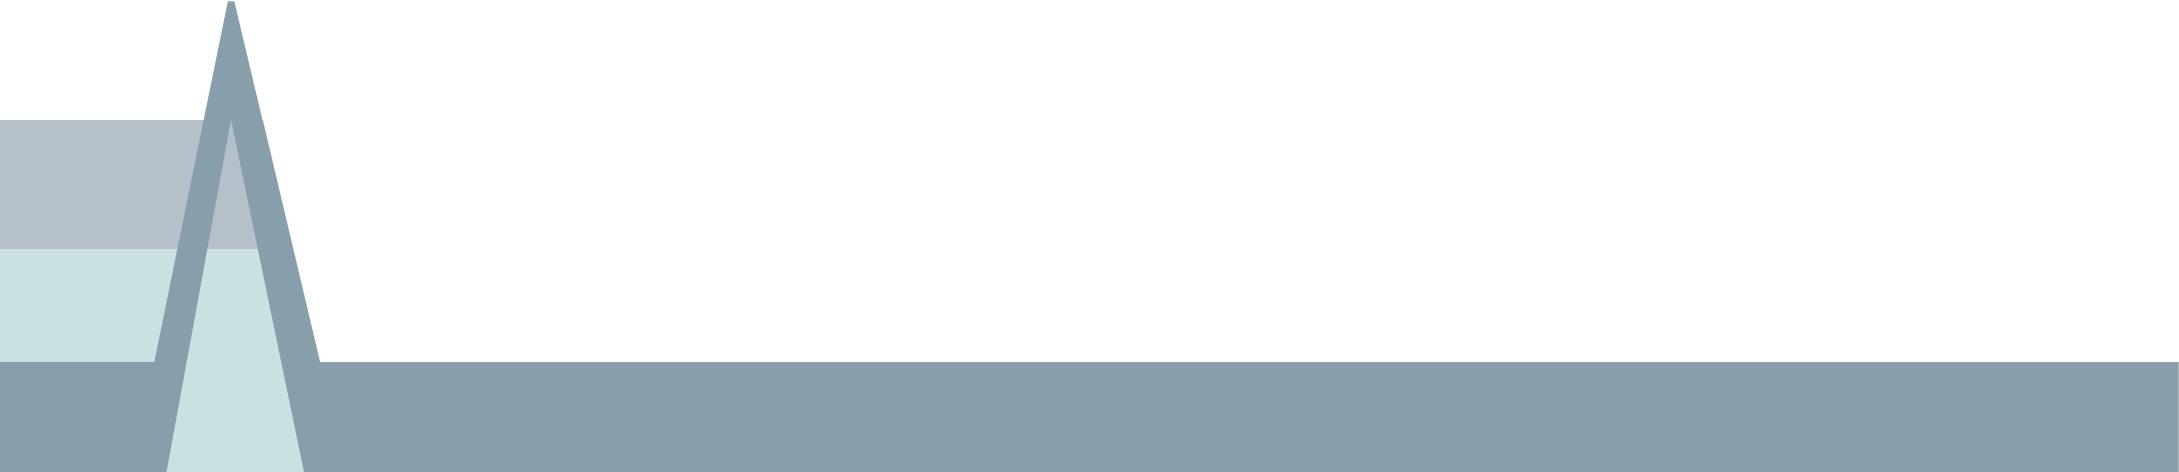 SLanners letterhead 1.jpg